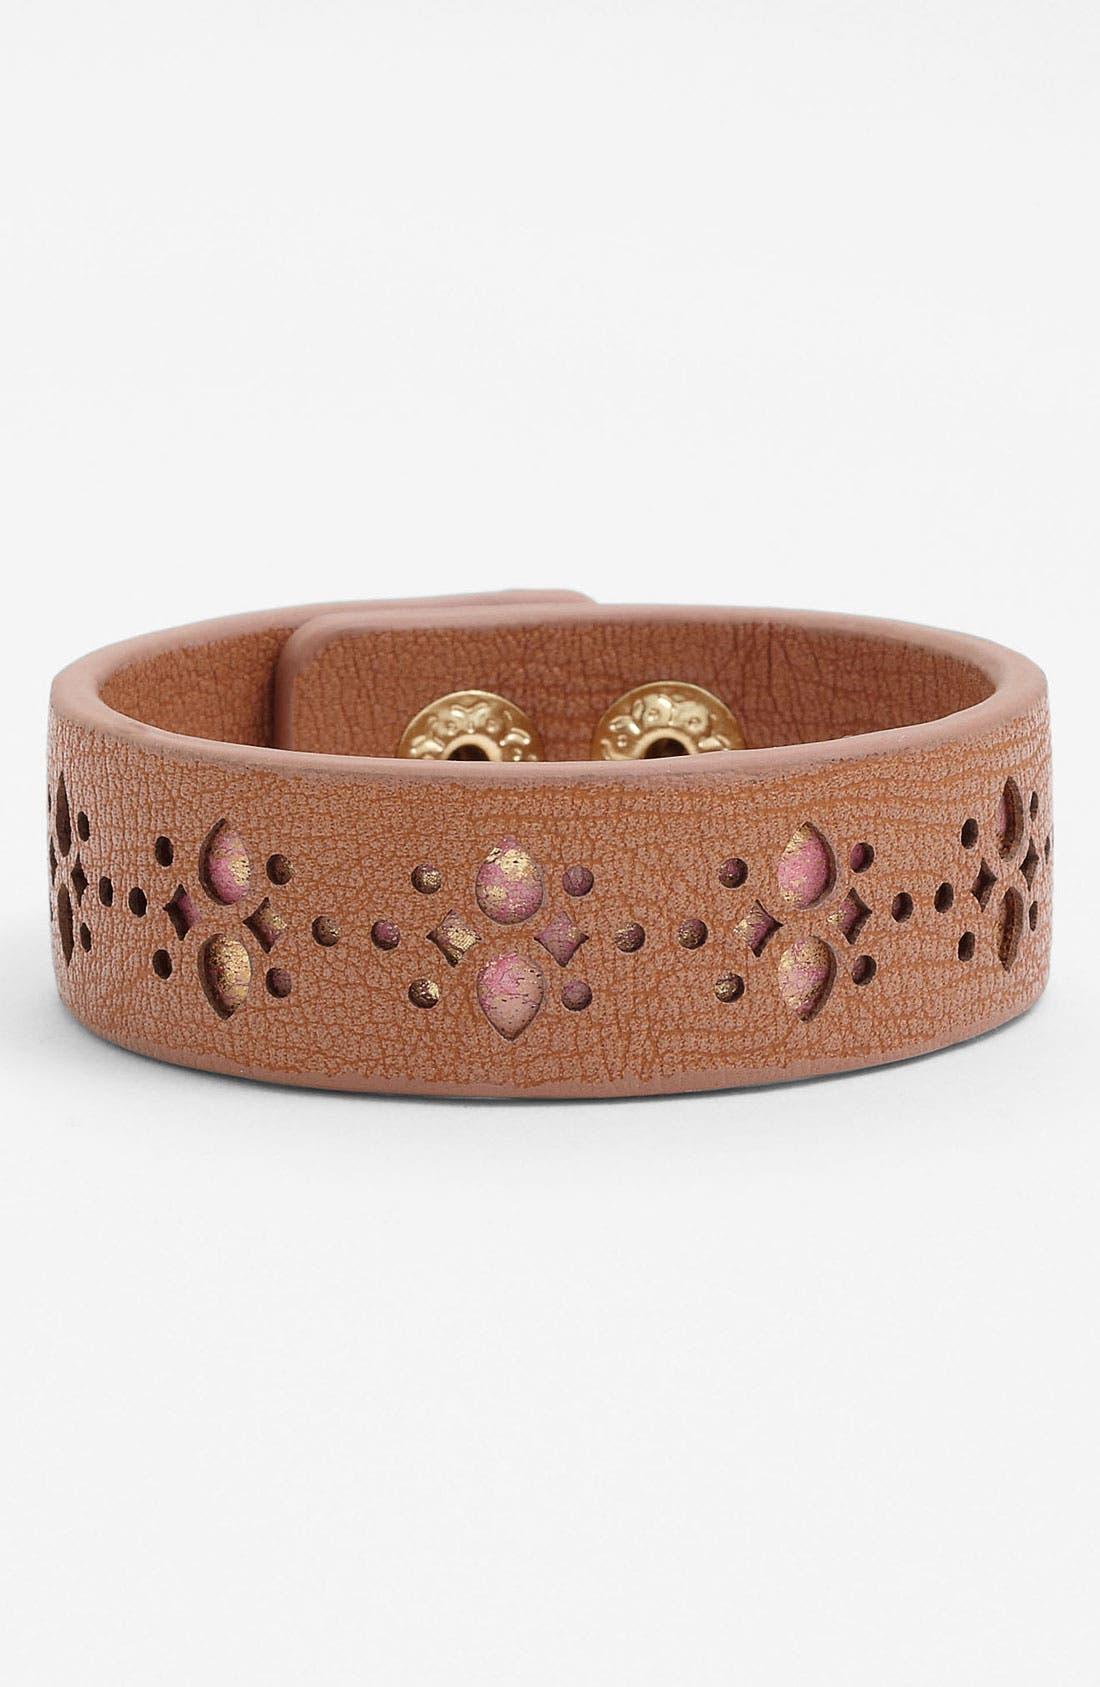 Alternate Image 1 Selected - Jessica Simpson 'Snake My Hand' Wrap Bracelet